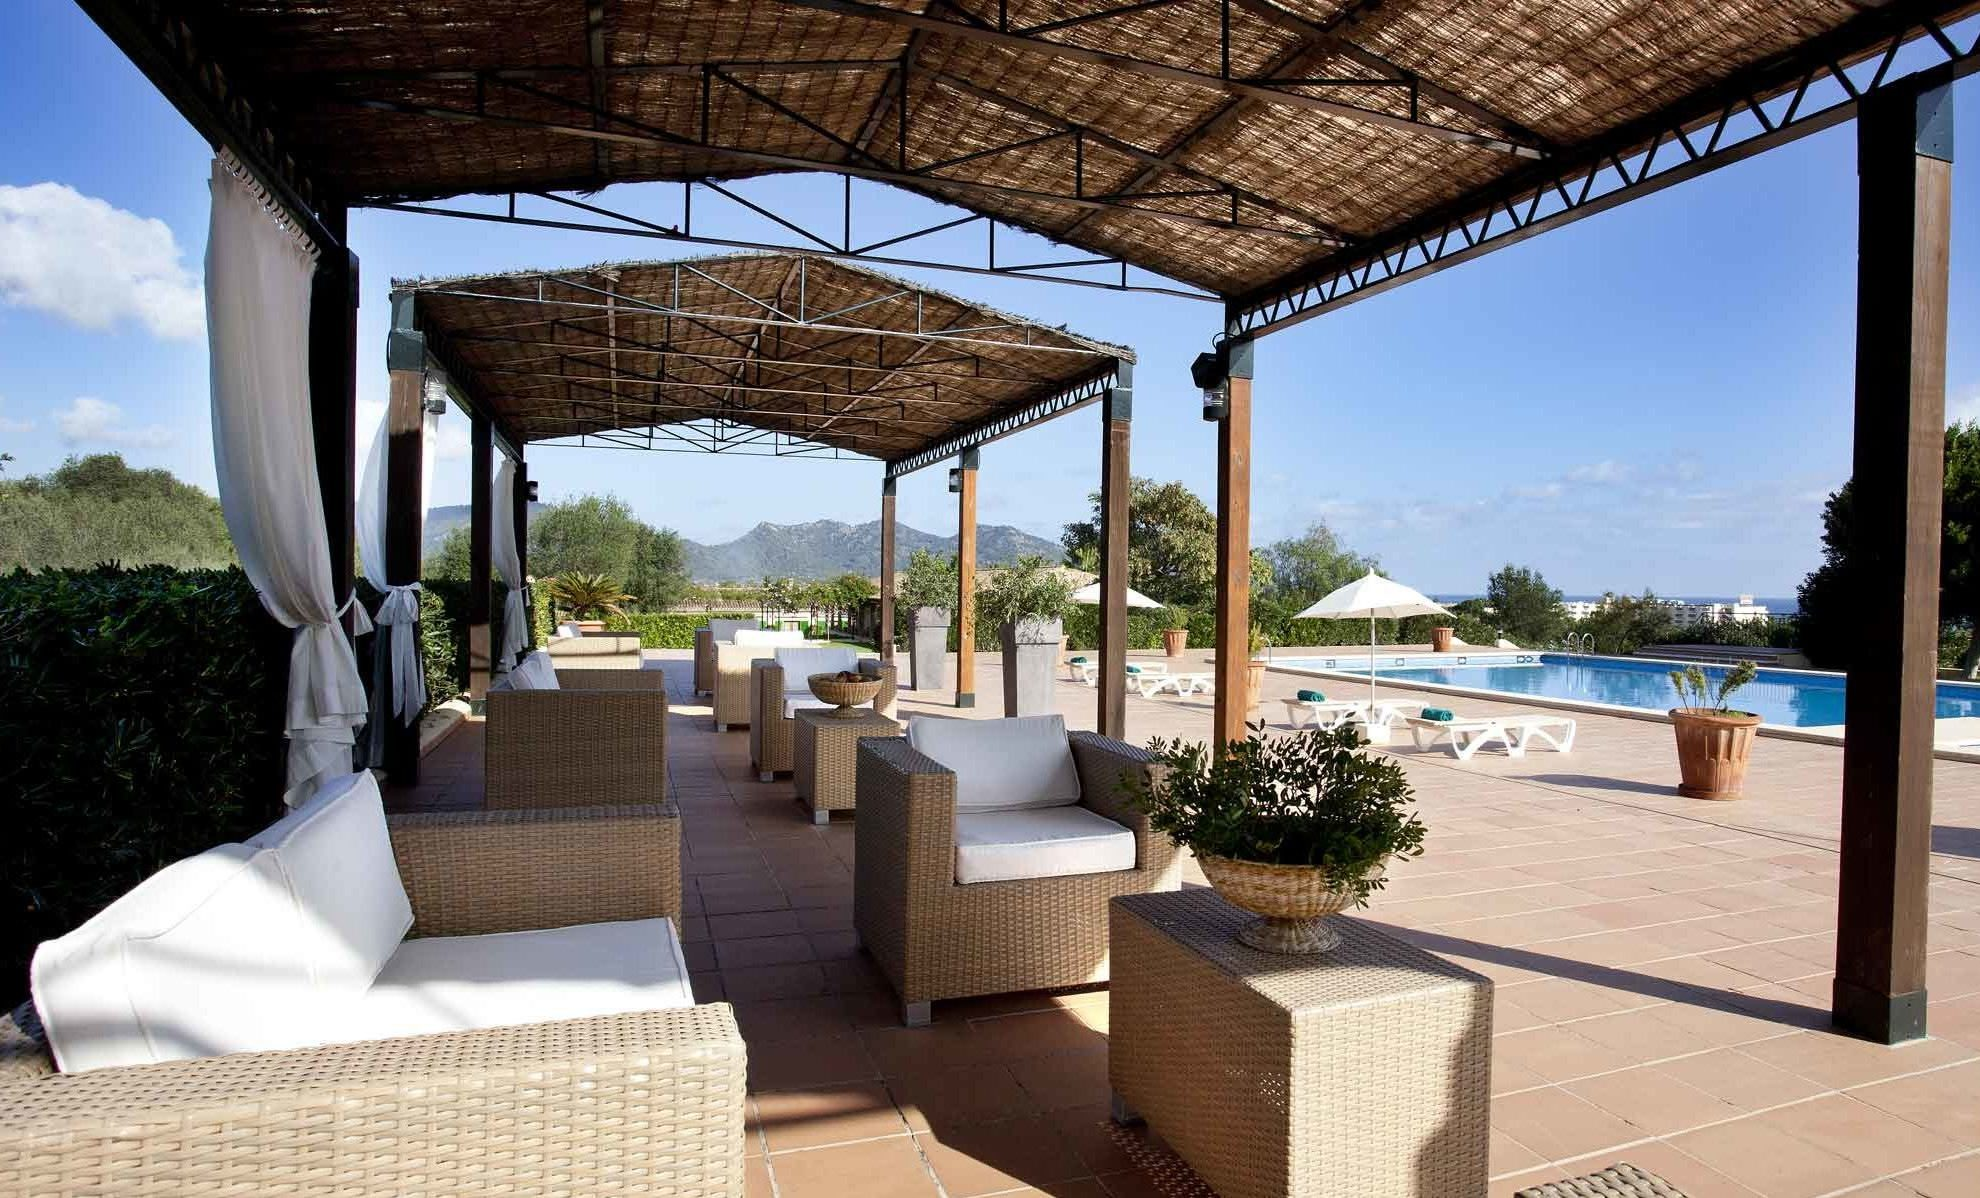 soncorb e1588704108175 - Where to rest-Península de Llevant